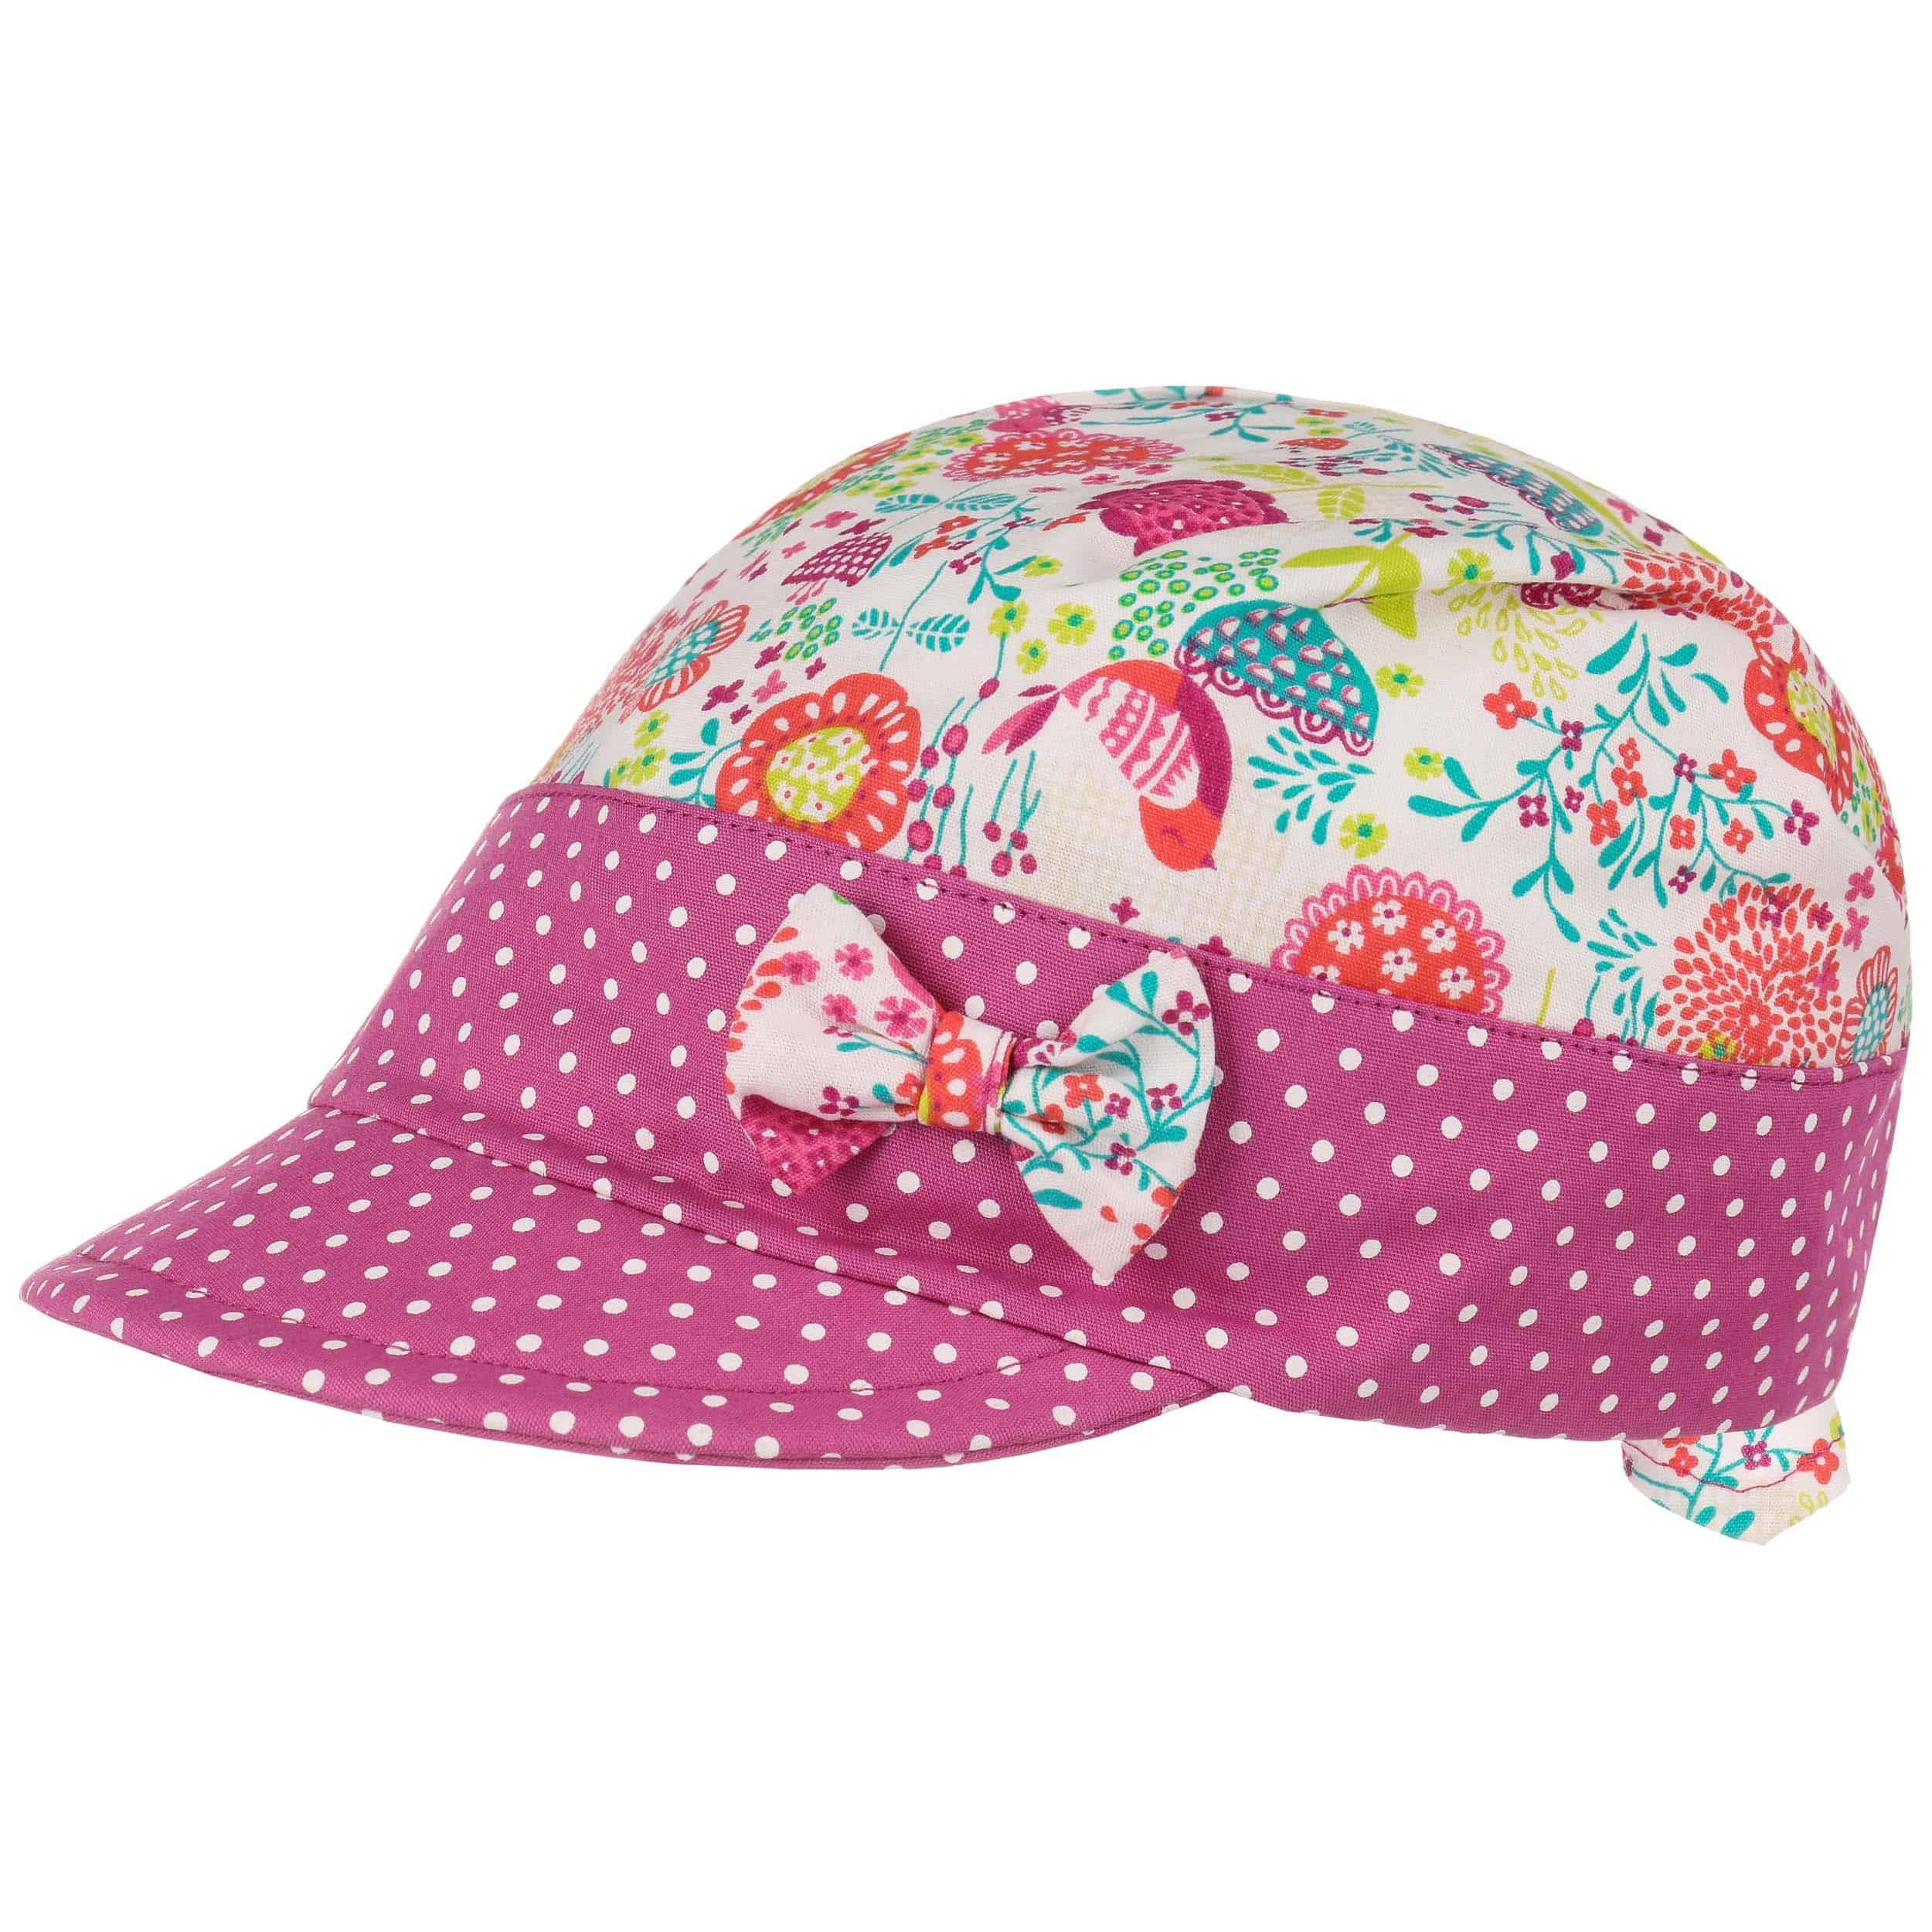 Bandana con Visera Dotty by Sterntaler - Bandanas - sombreroshop.es 934a460b204